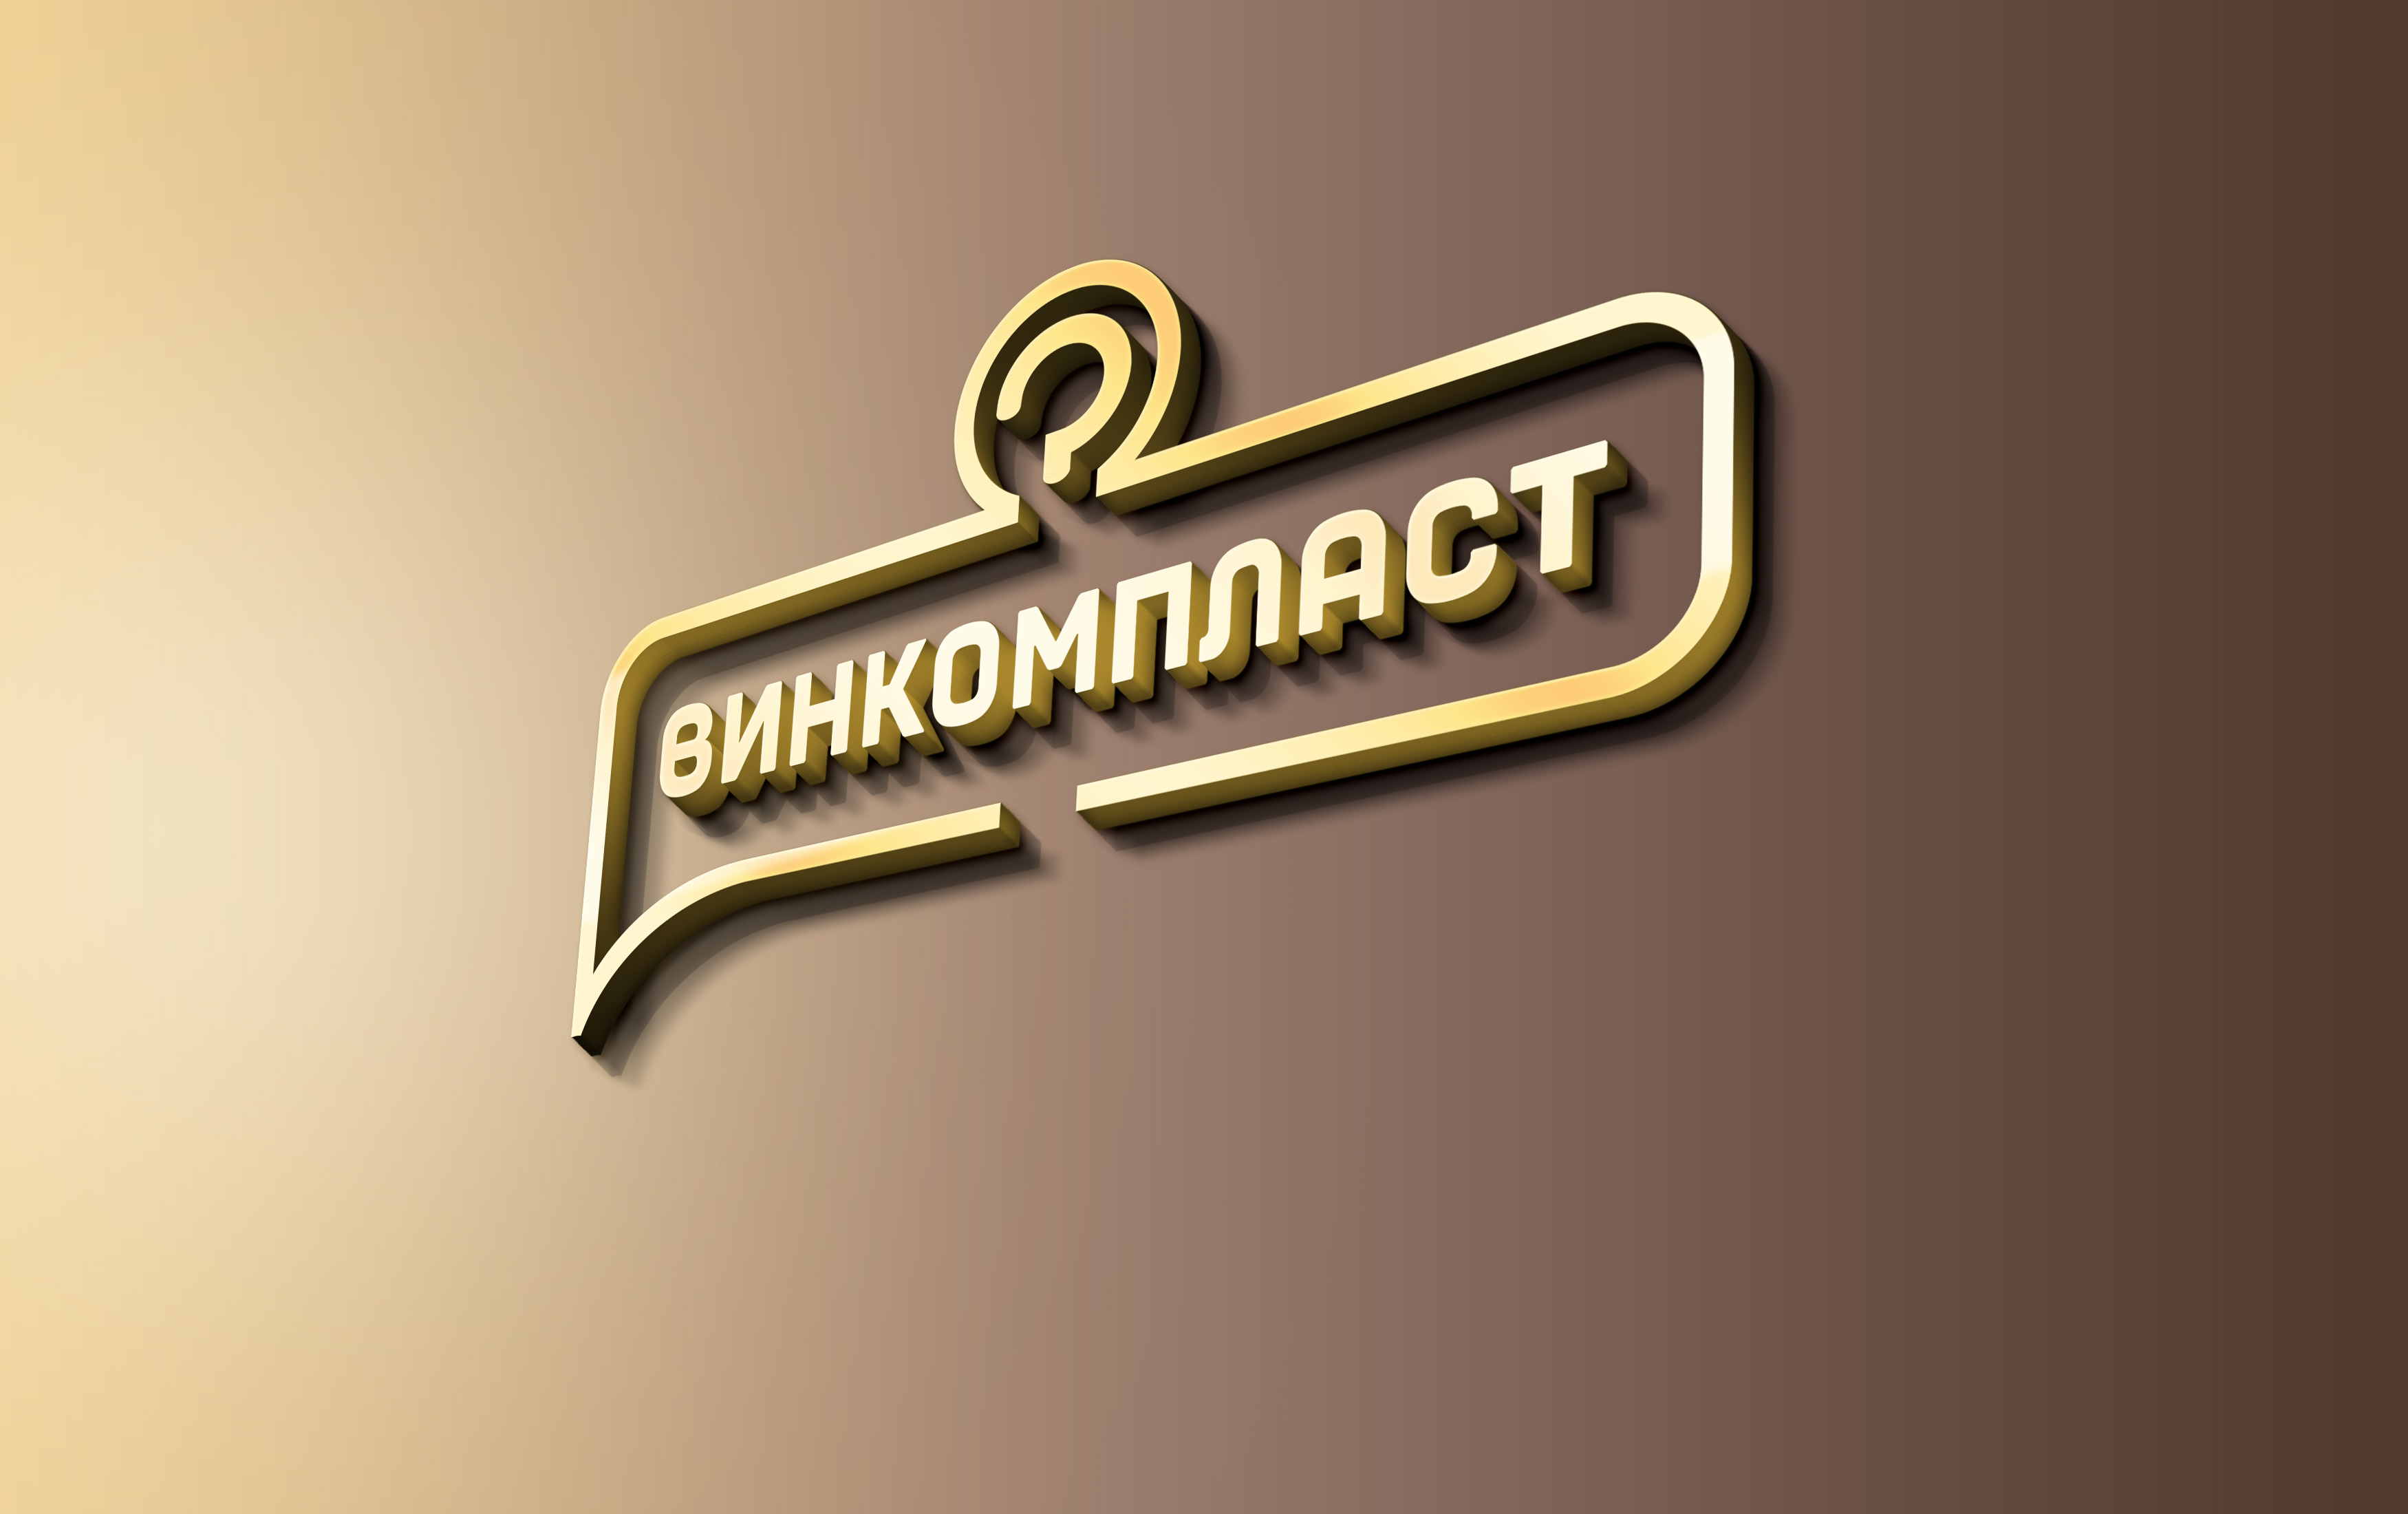 Логотип, фавикон и визитка для компании Винком Пласт  фото f_8755c39f10be102a.jpg